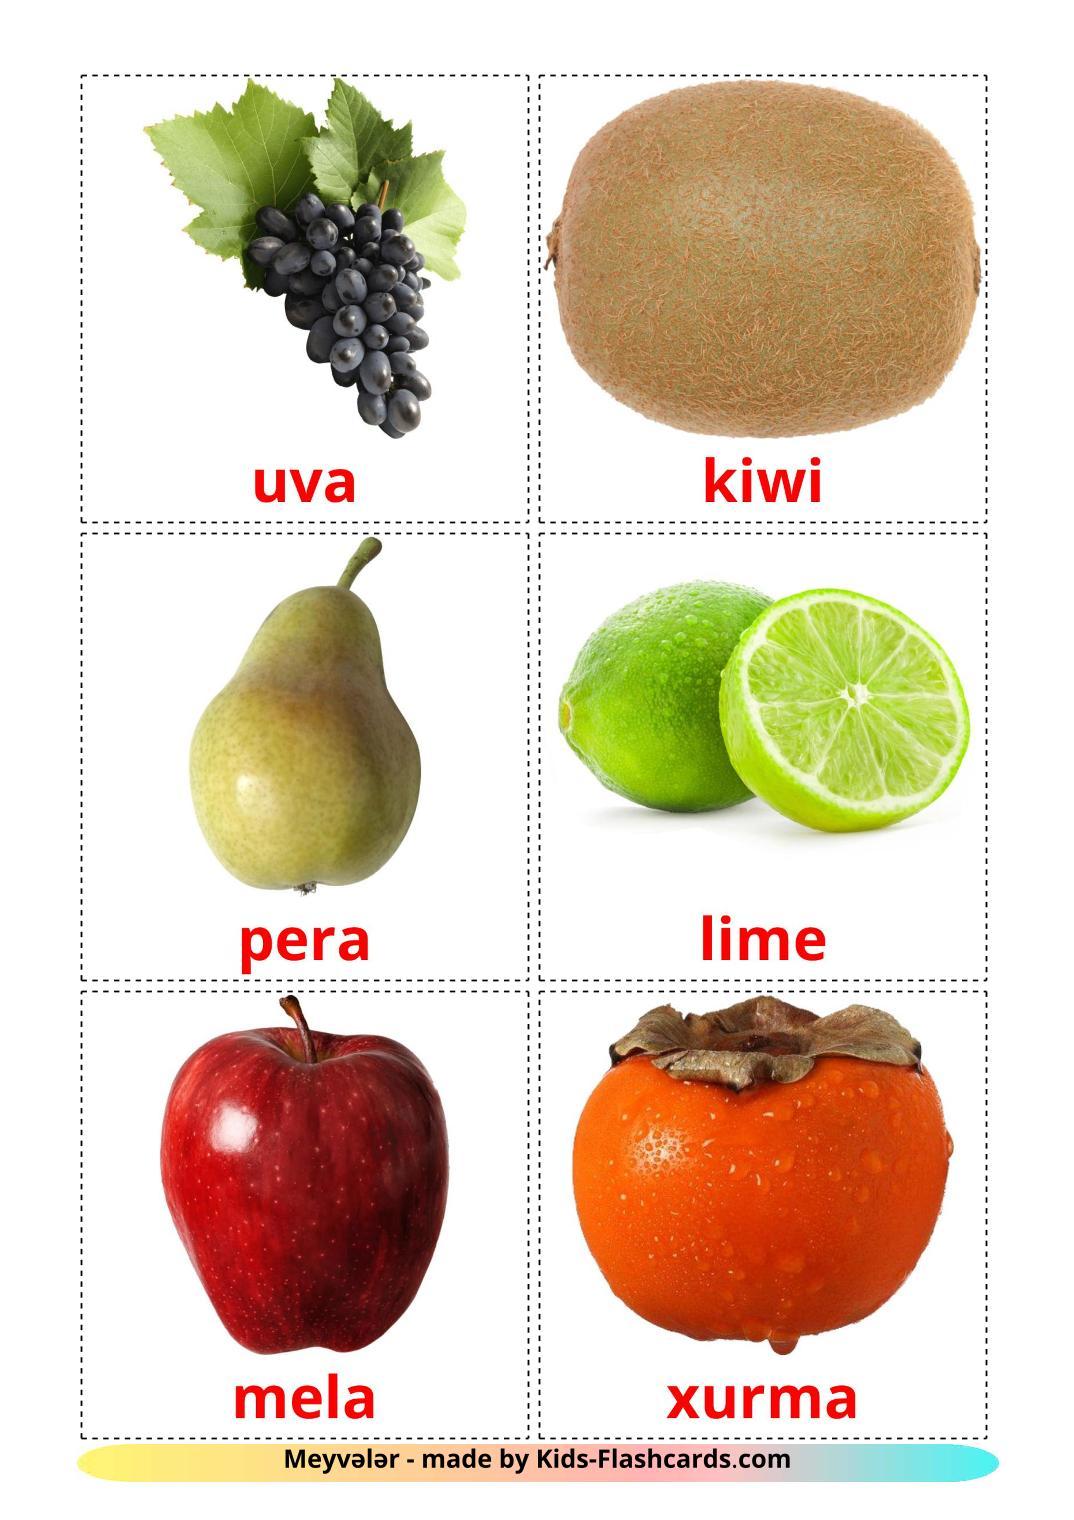 Fruits - 20 Free Printable azerbaijani(cyrillic) Flashcards